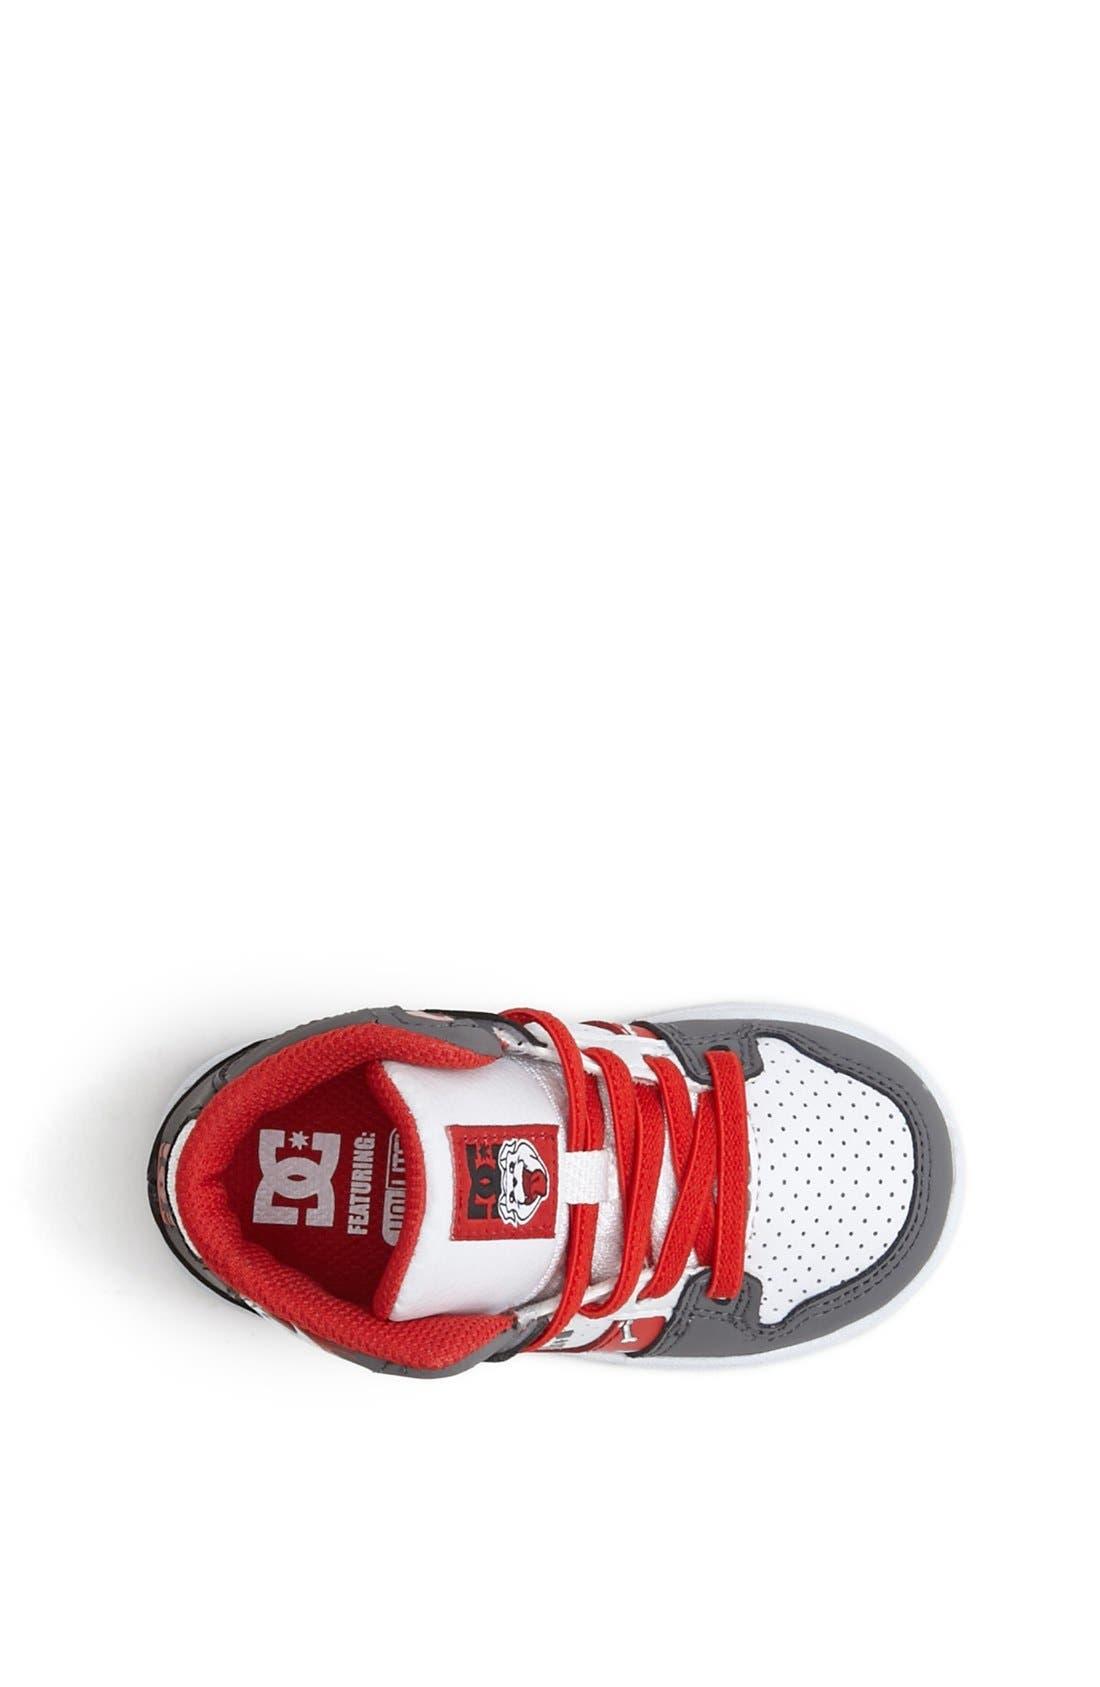 Alternate Image 3  - DC Shoes 'Wild Grinders - Rebound' Sneaker (Walker & Toddler)